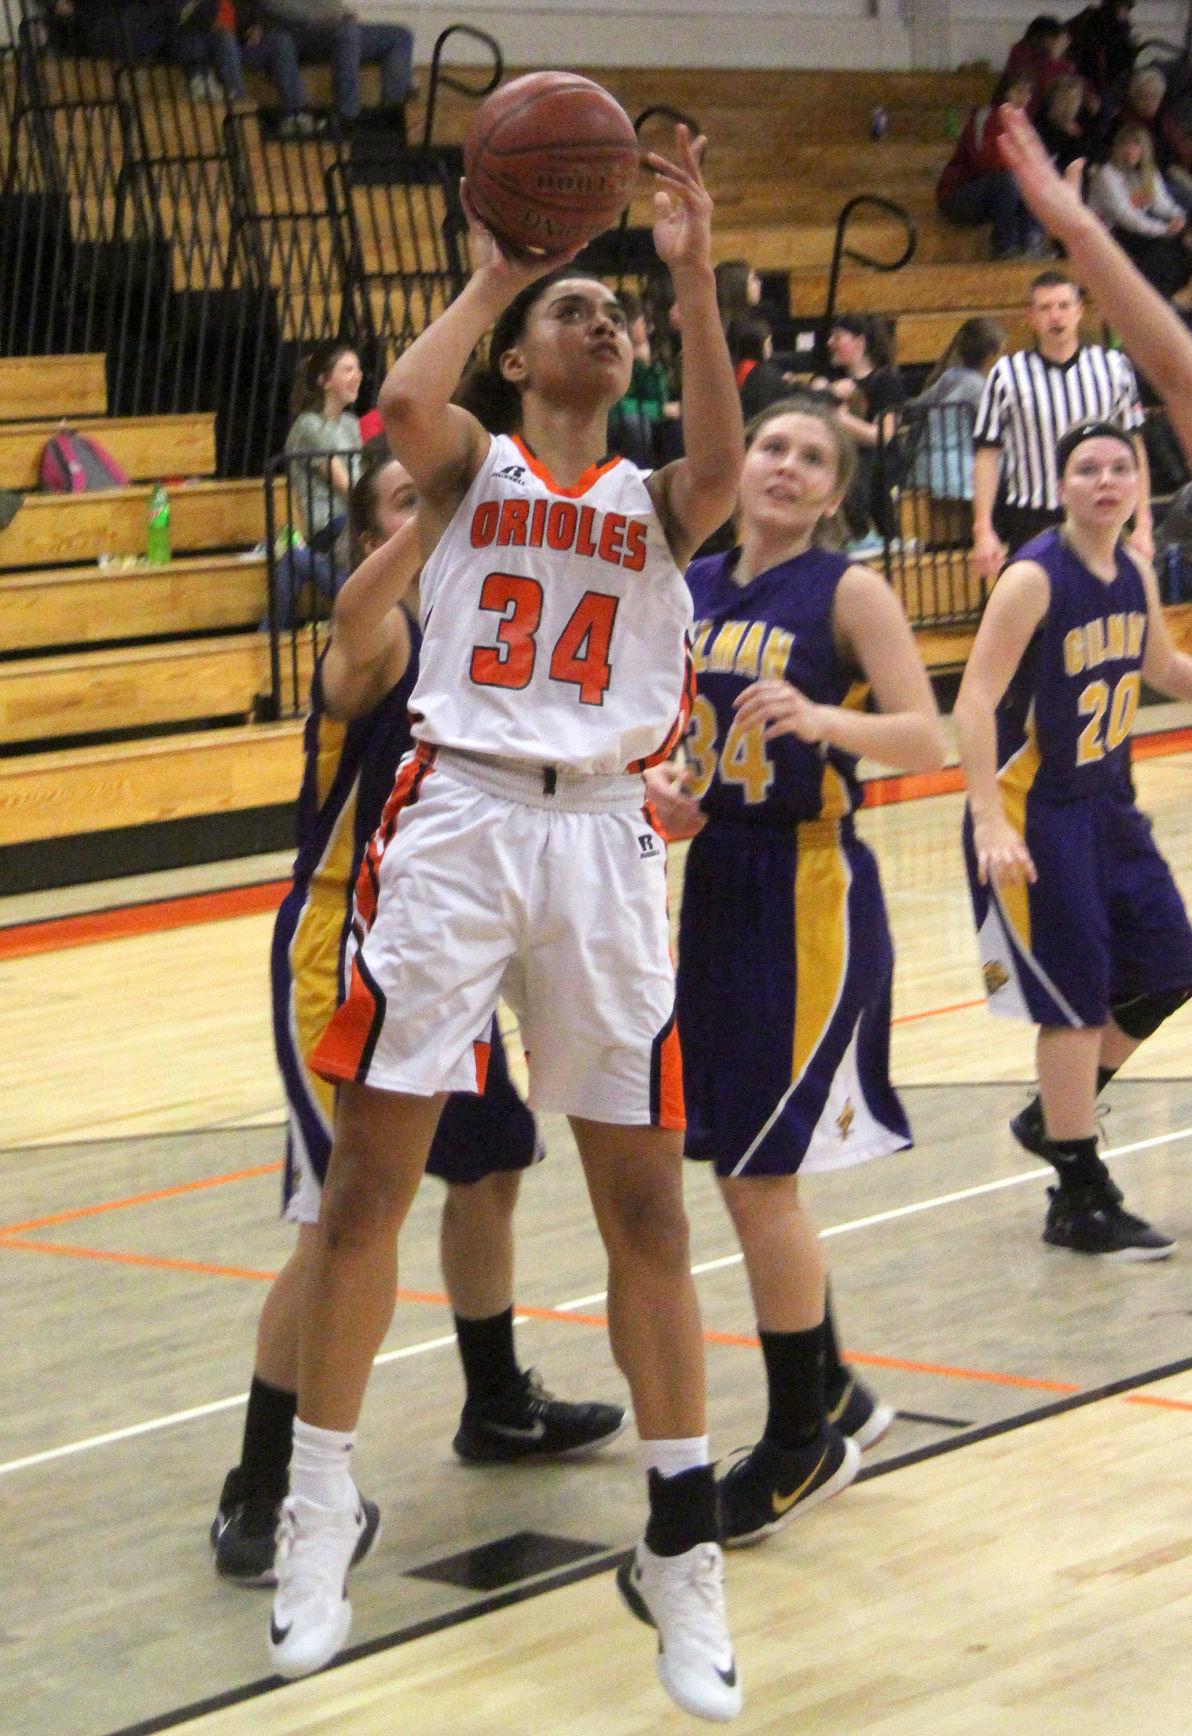 Gilman at Stanley-Boyd girls basketball 2-15-18